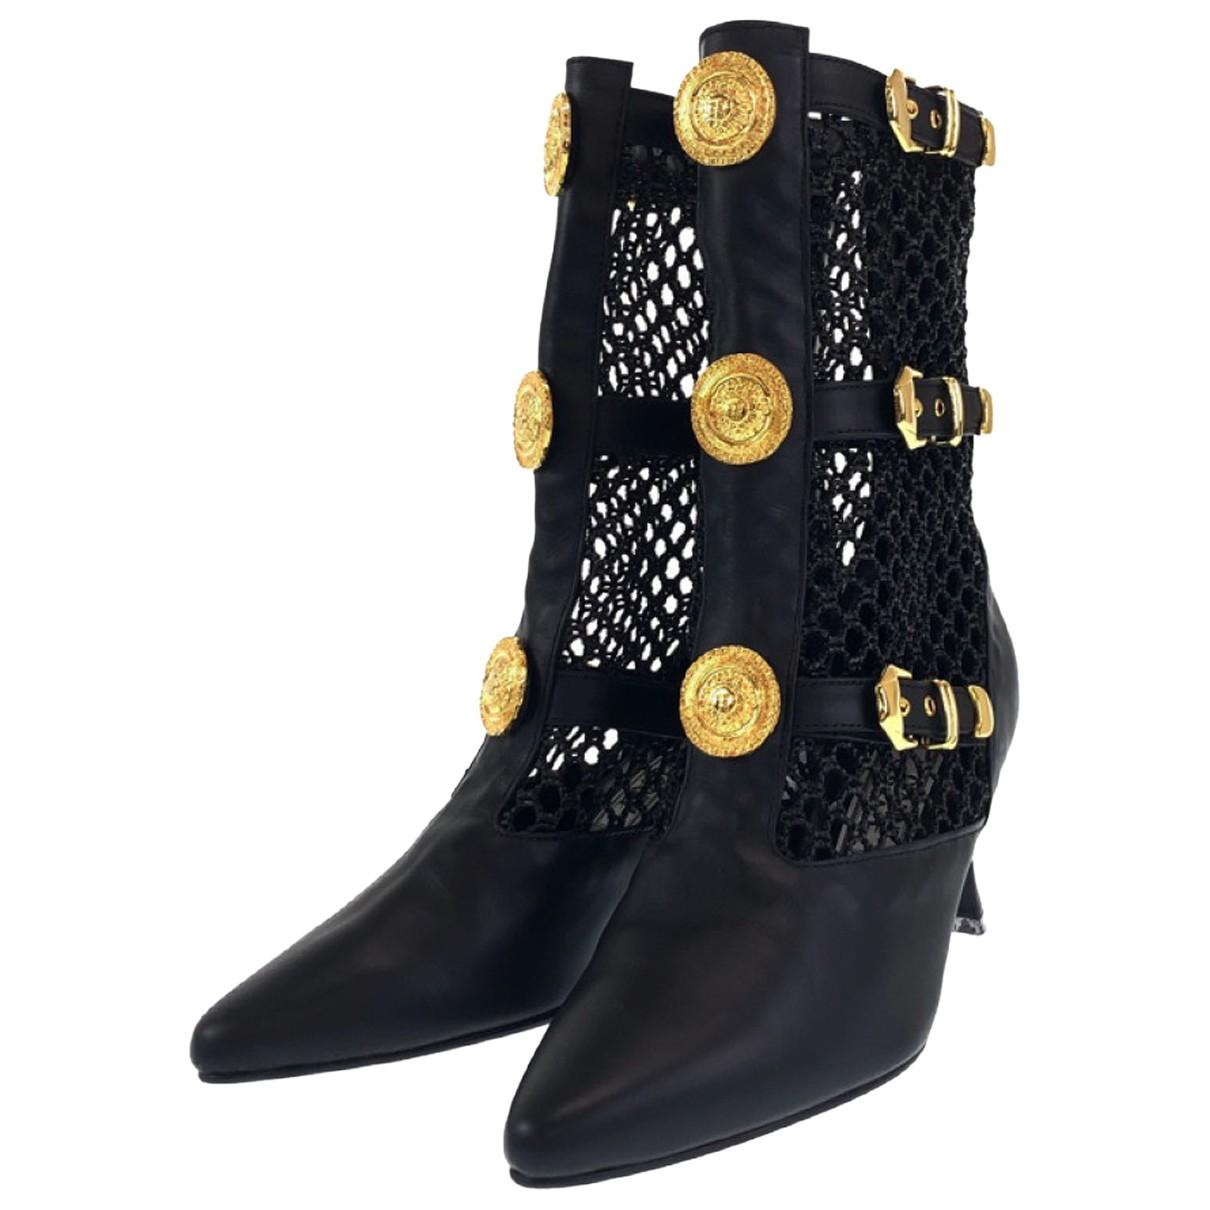 Botas de Cuero Gianni Versace